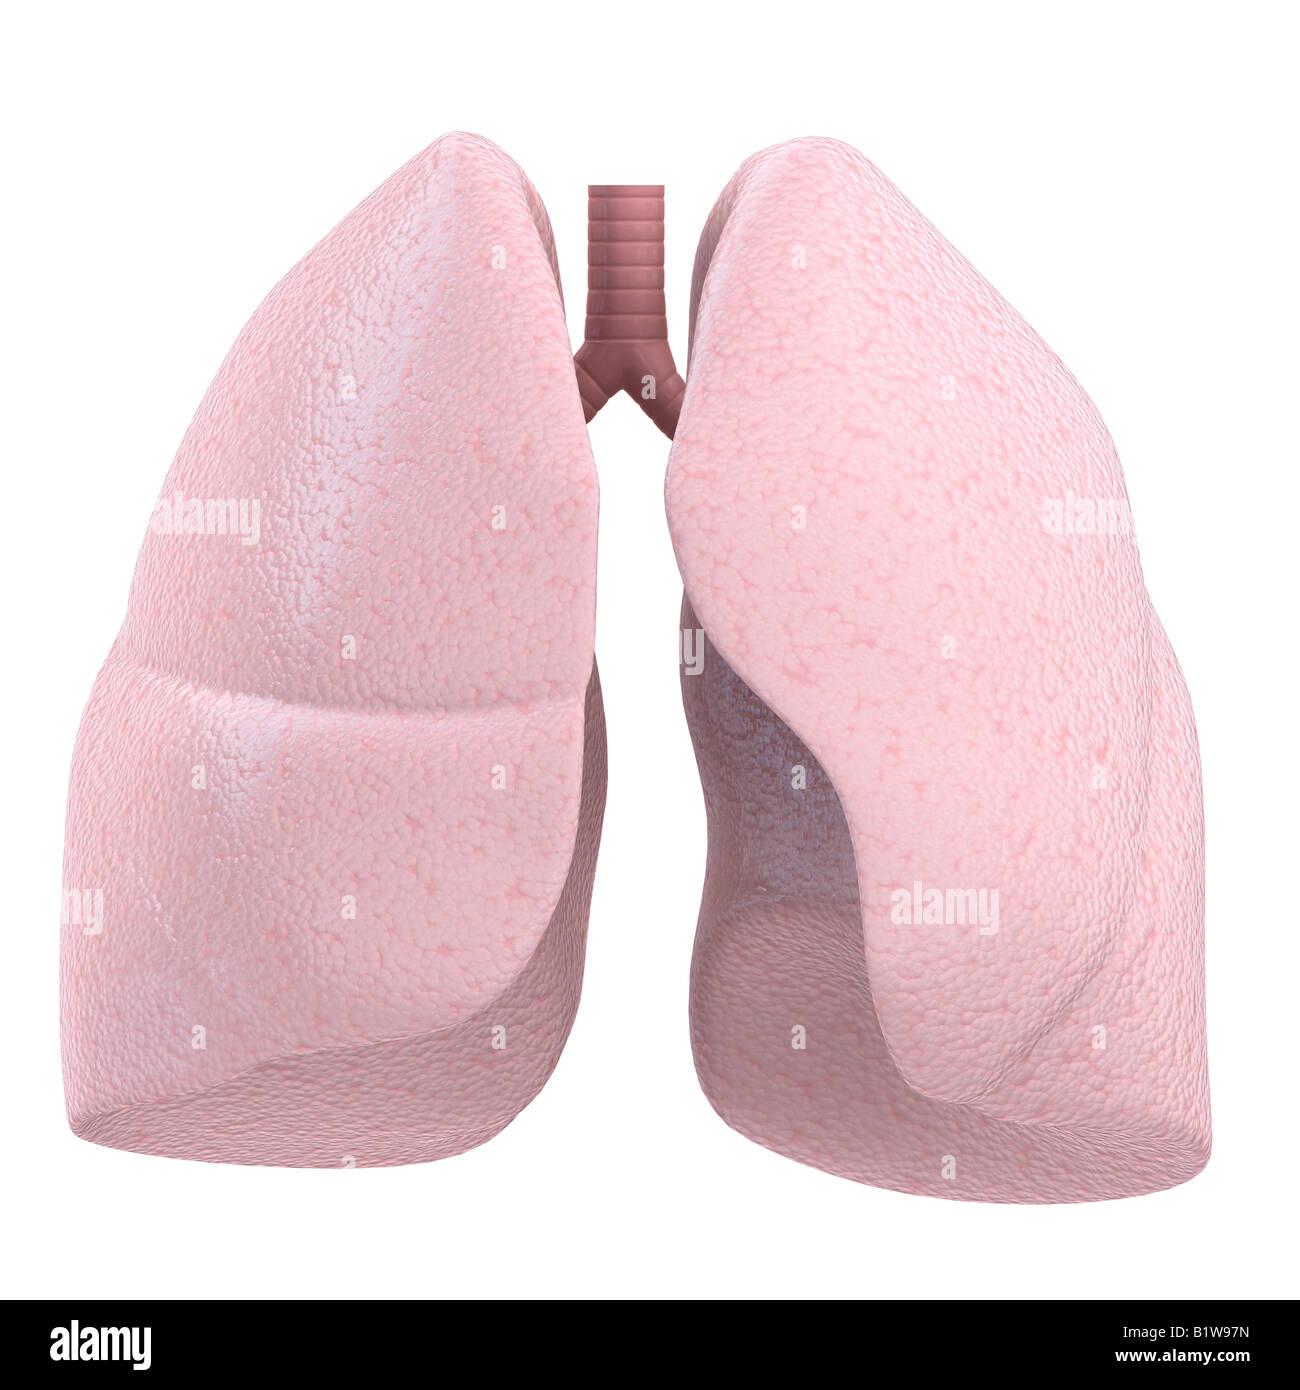 human lung - Stock Image